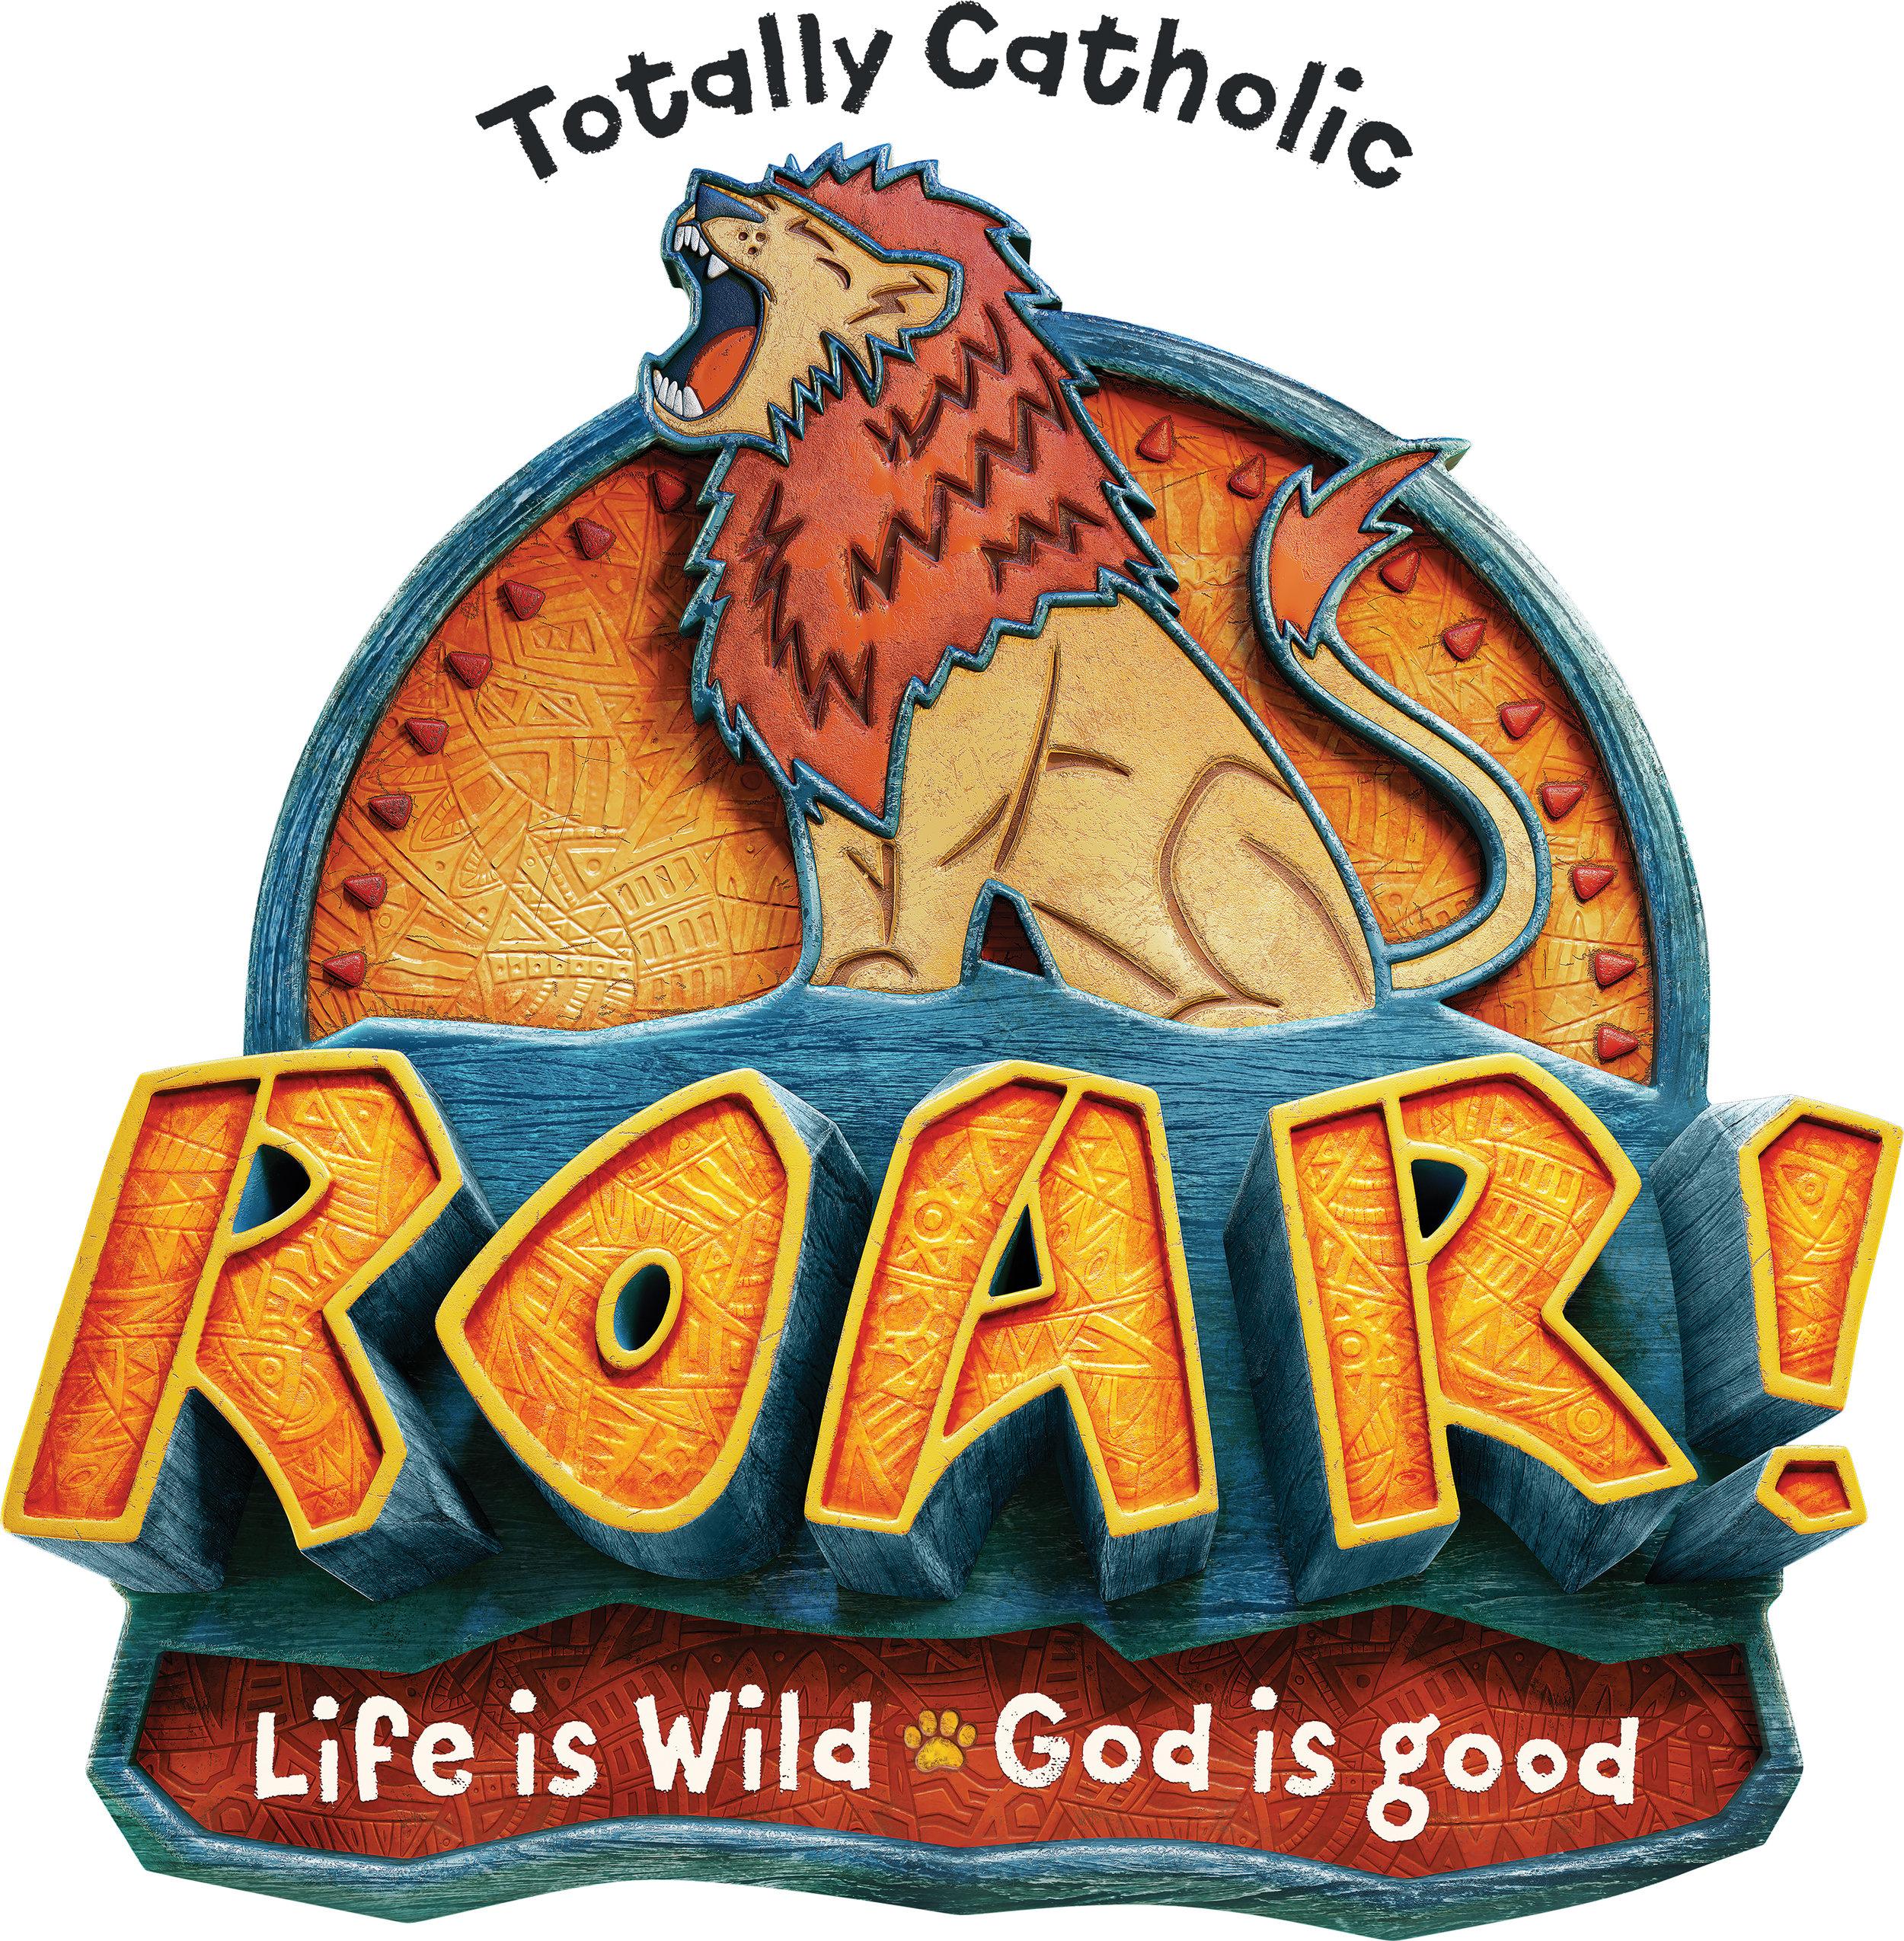 roar-osv-vbs-logo-HiRes-RGB.jpg